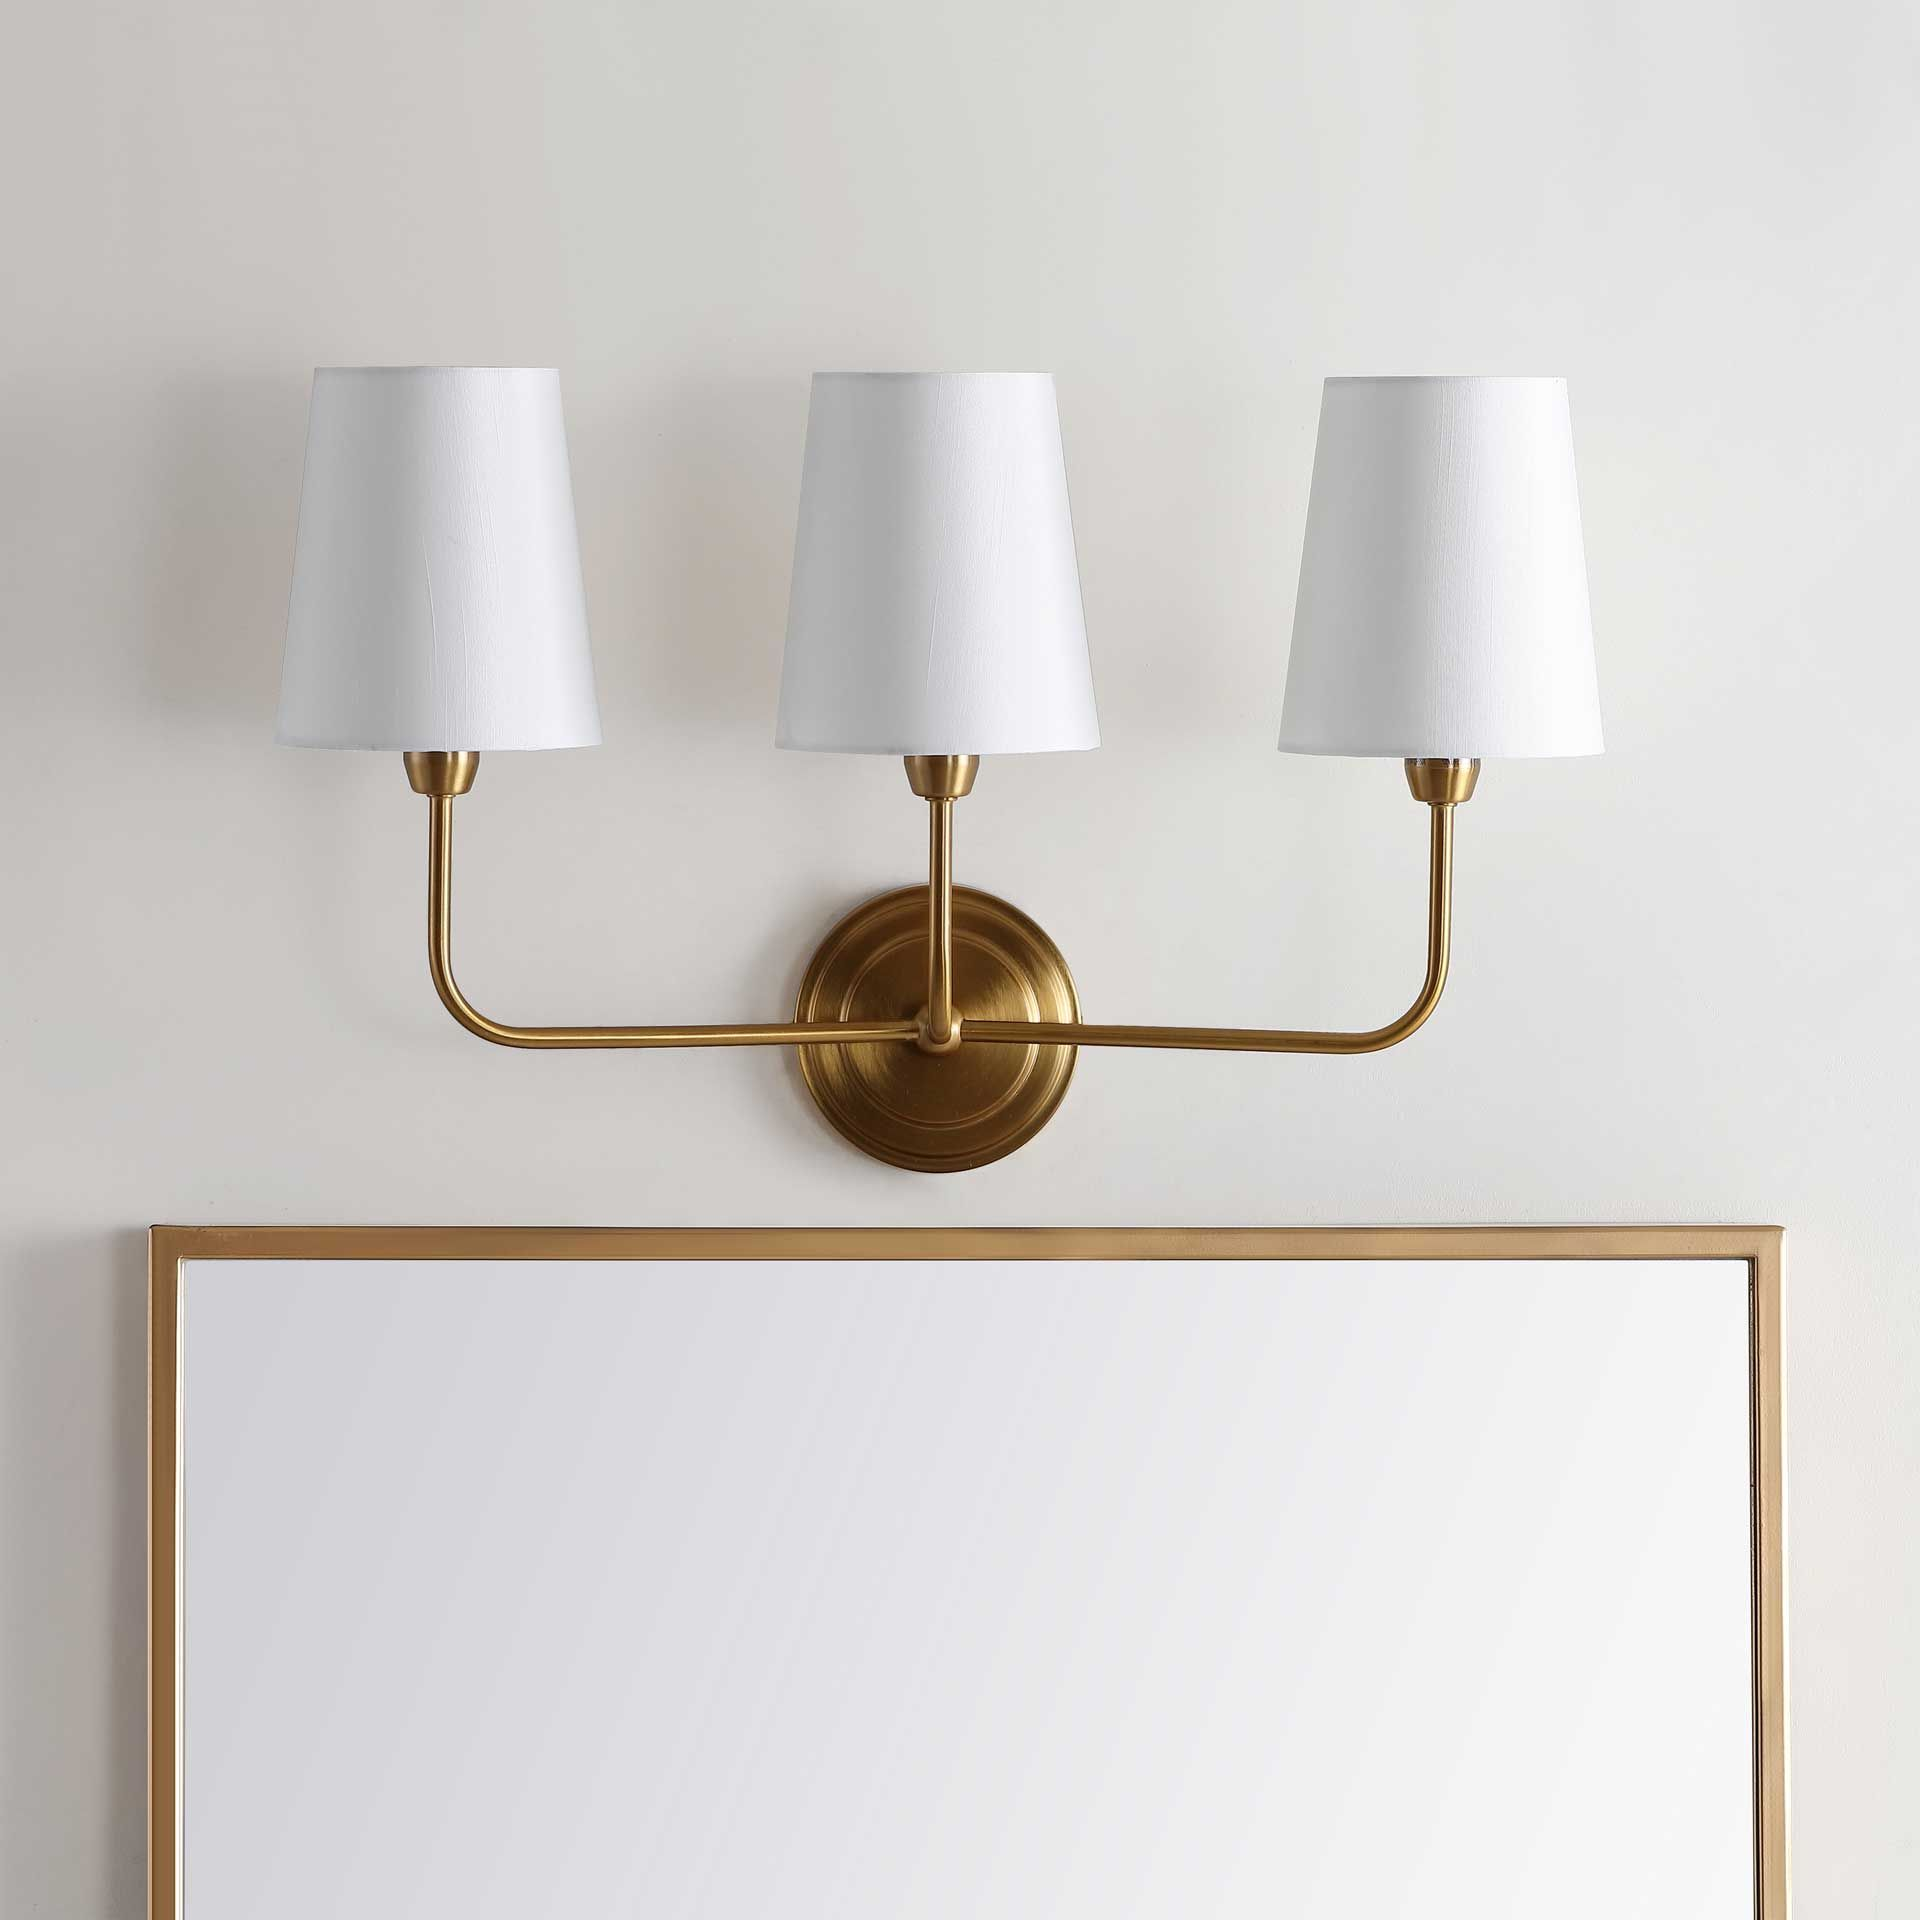 Saga Three Light Wall Sconce Brass Gold In 2021 Wall Lights Wall Sconces Wall Sconce Lighting